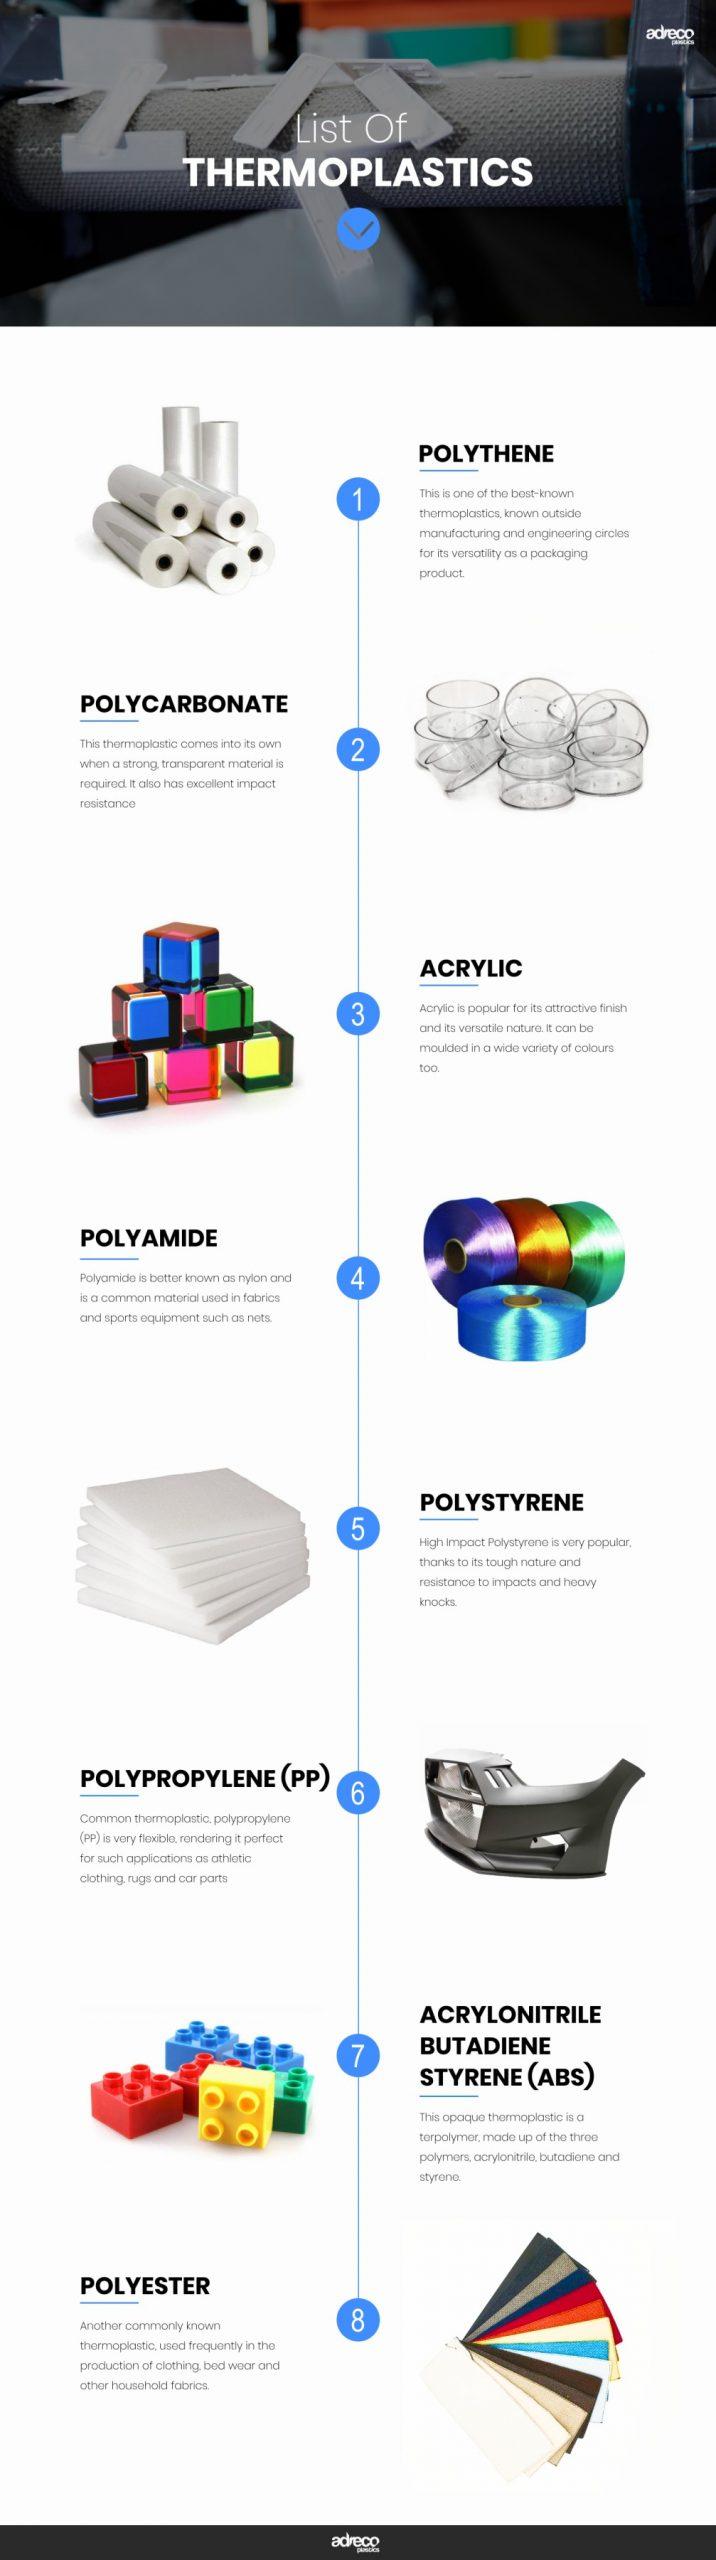 List of Thermoplastics Infographic